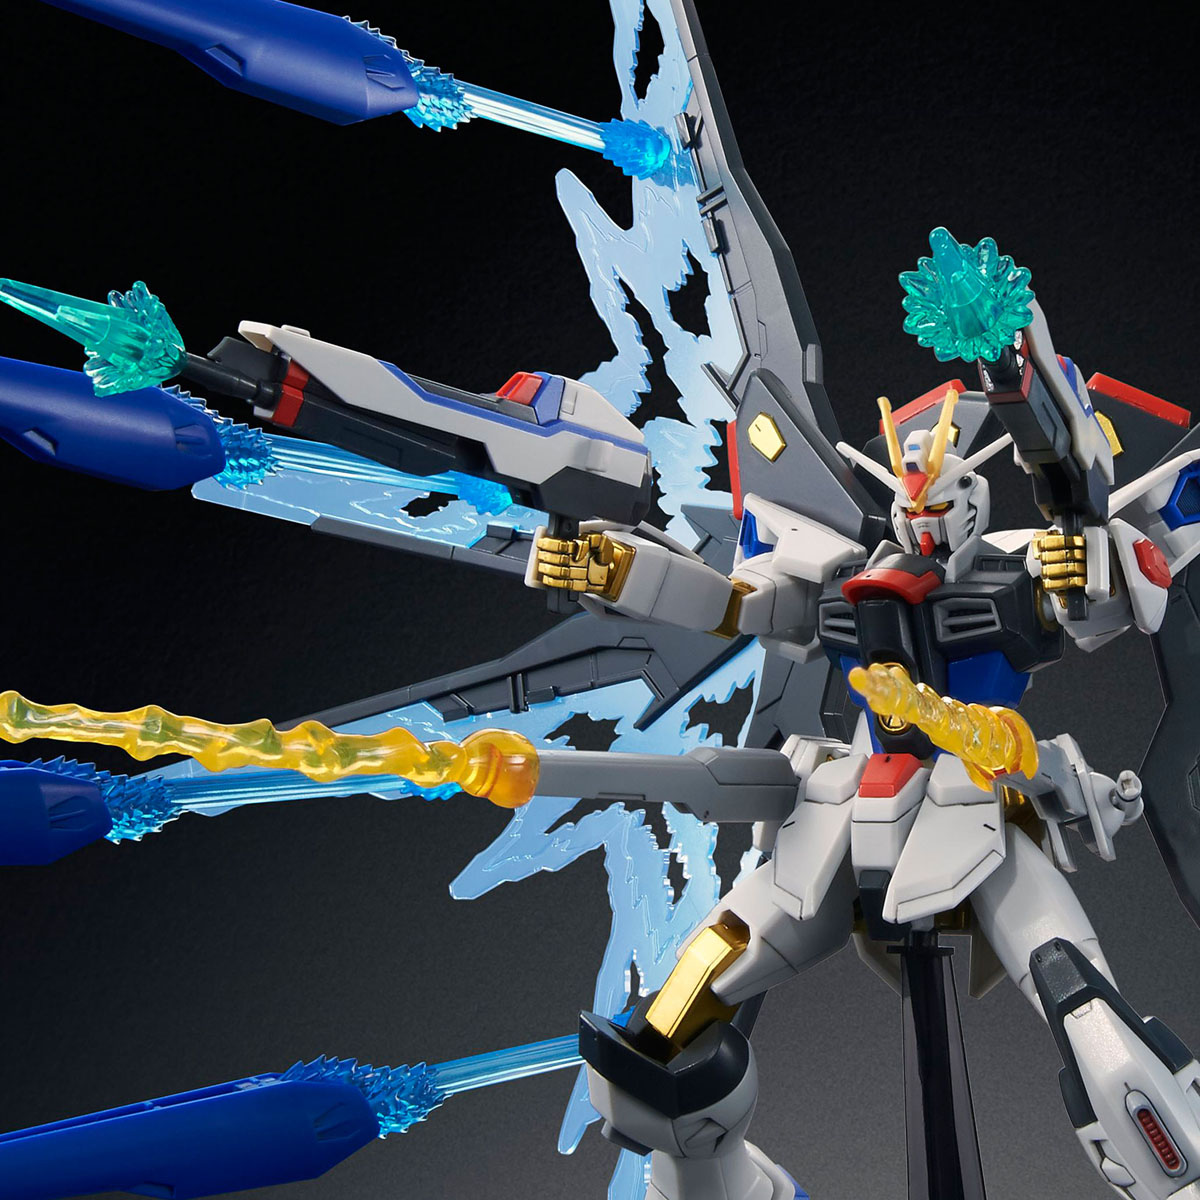 Pre_Order:P-bandai:HGCE 1/133 Strike freedom Gundam Light Wing DX Edtion 4109yen สินค้าเข้าไทยเดือน11 มัดจำ 500บาท